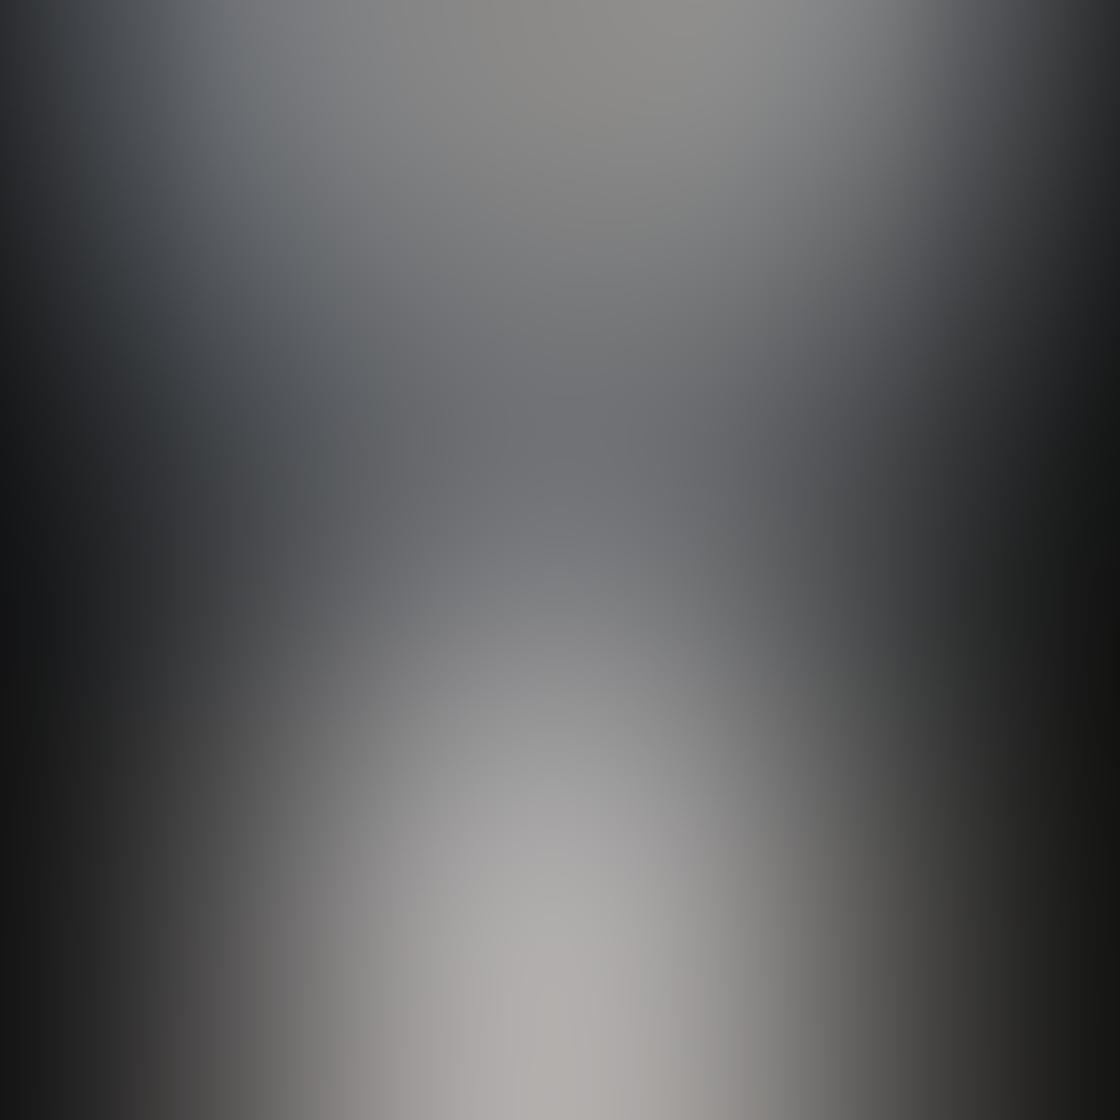 Shadow iPhone Photos 4